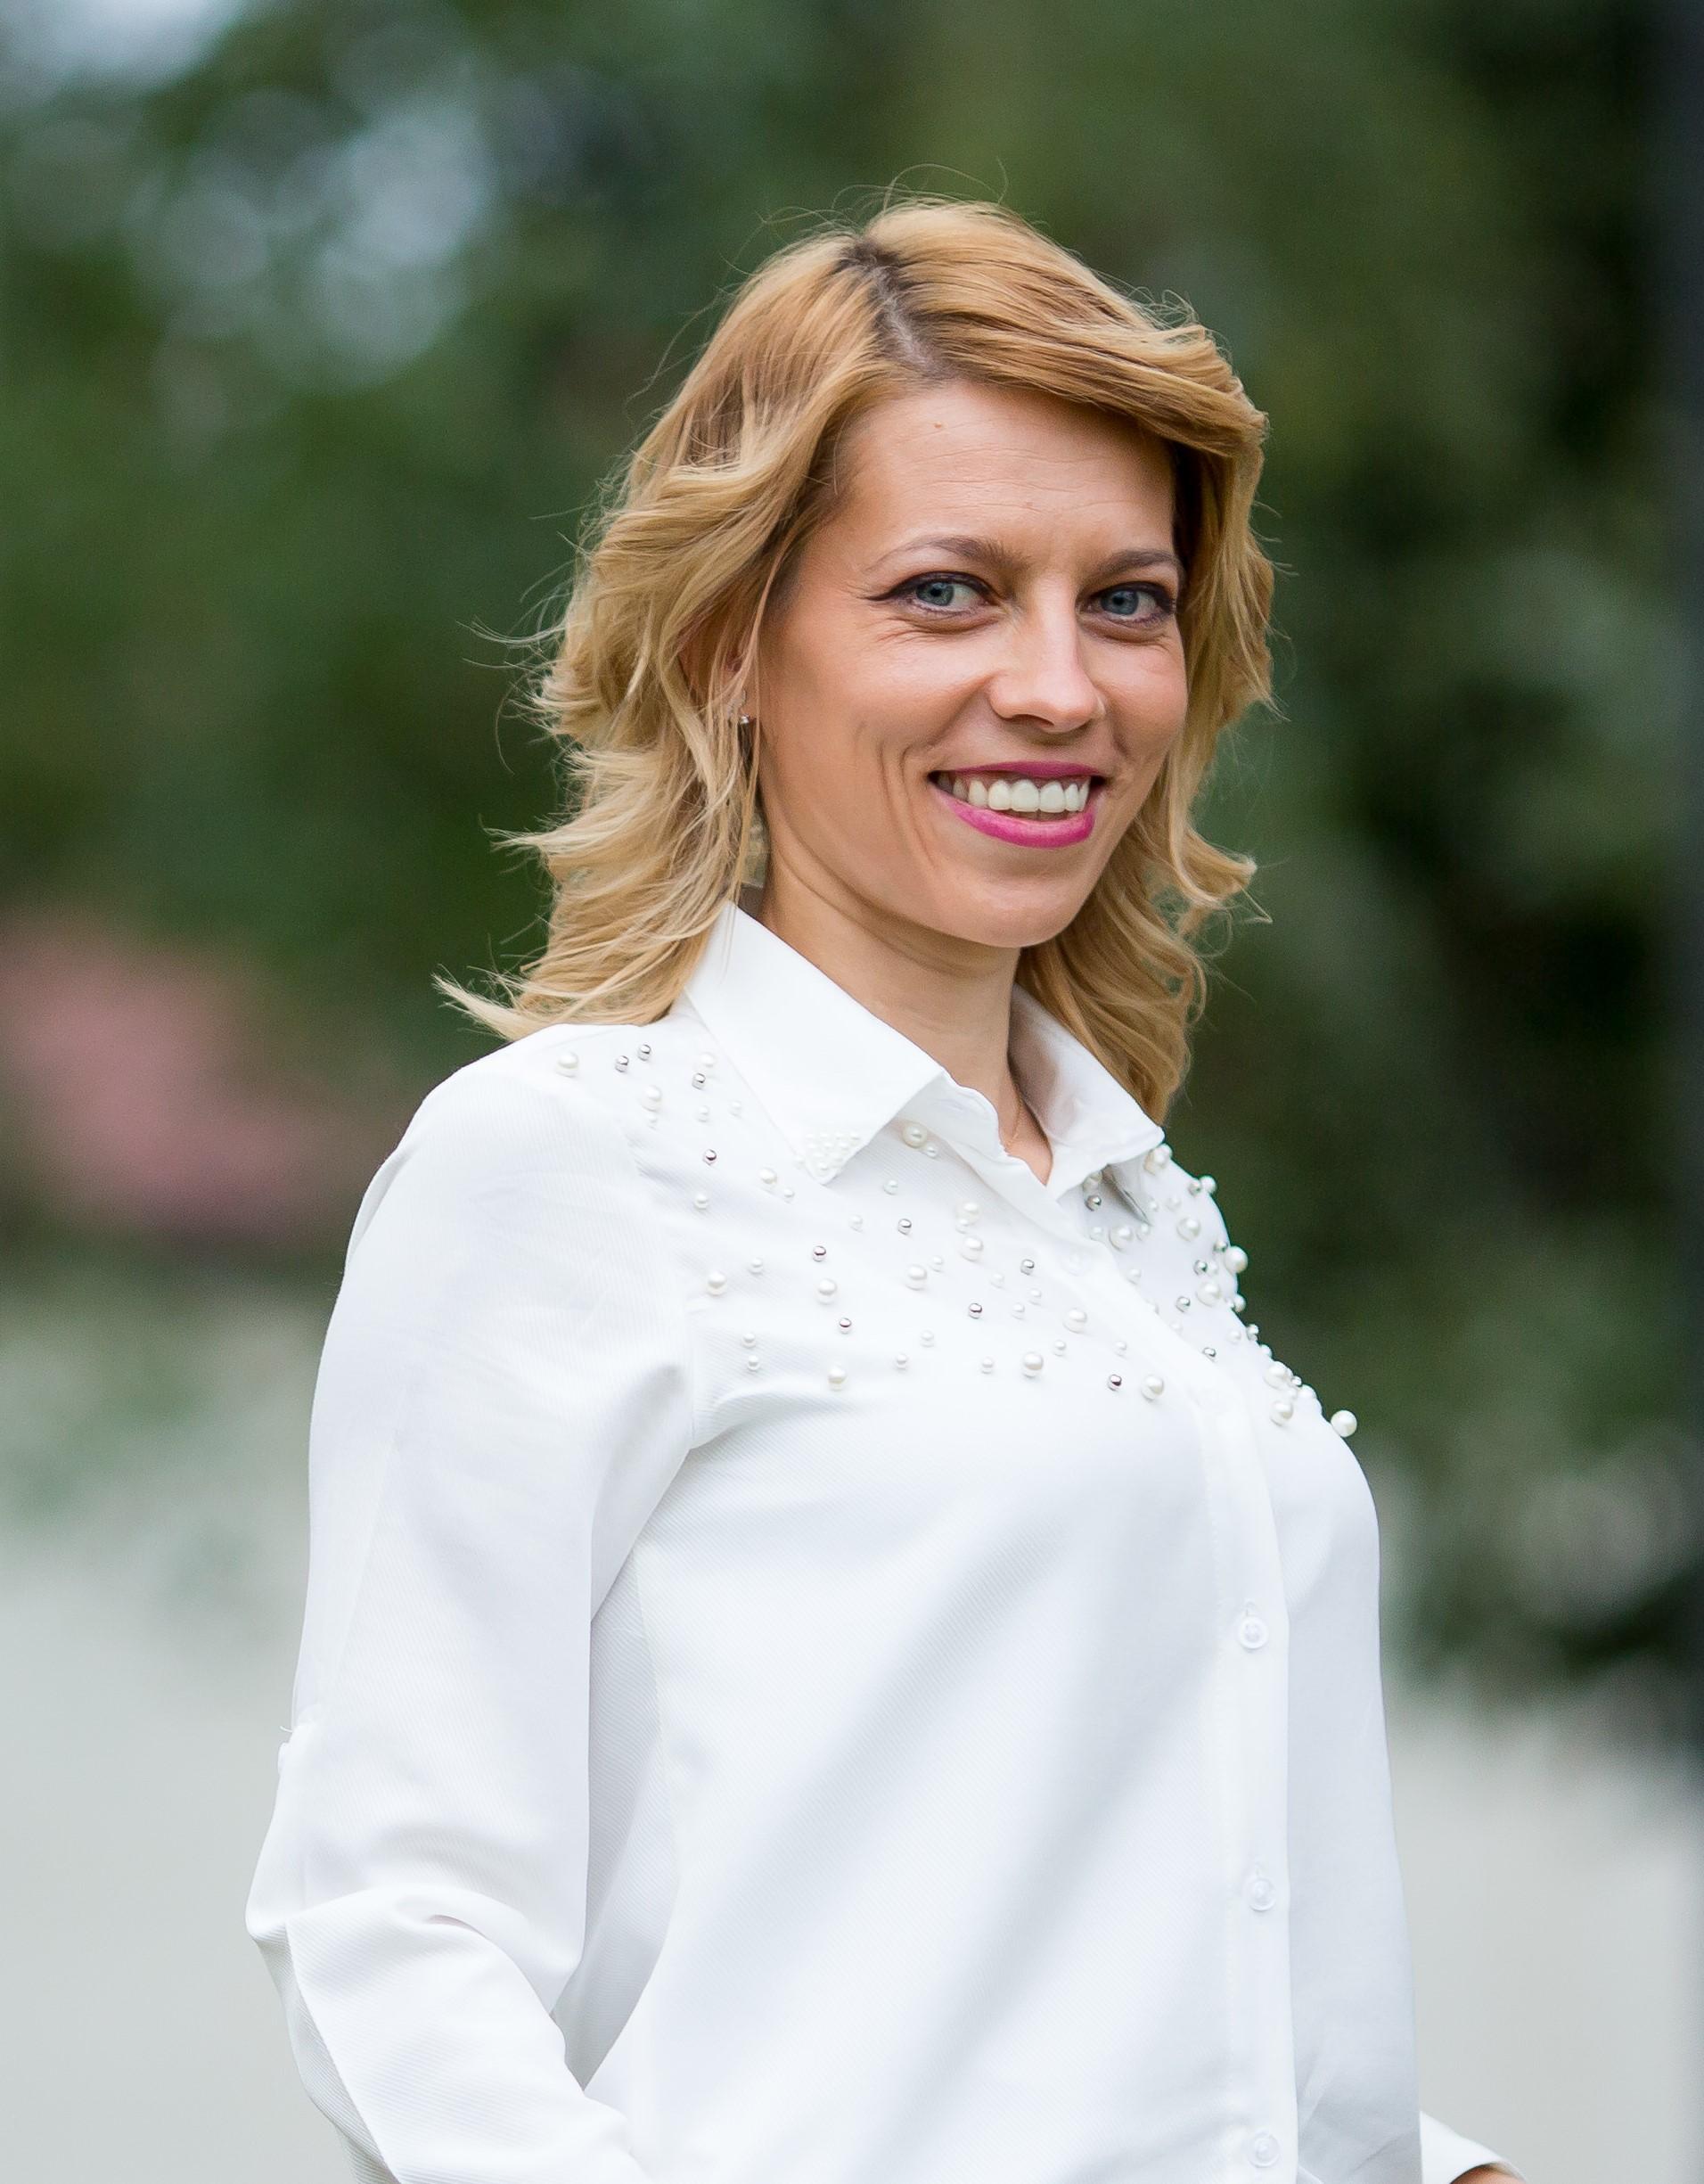 Gabriela Farcaș